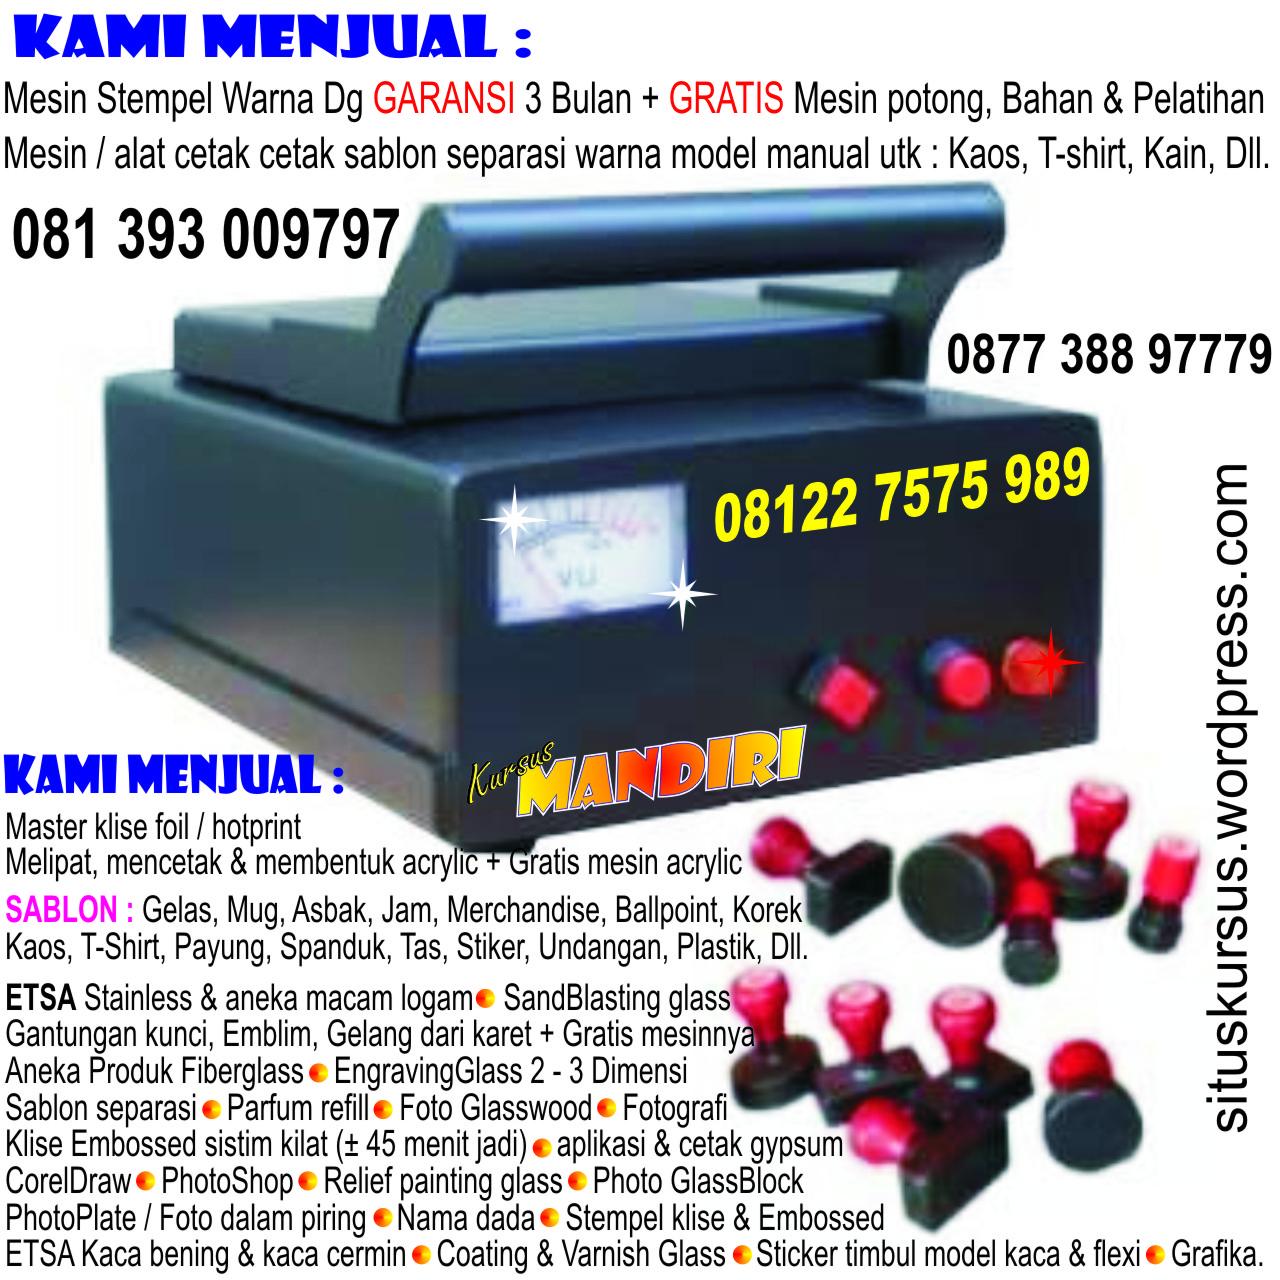 Kursus  Plakat Acrylic  Fiber, Sablon Gelas  Mug -2265